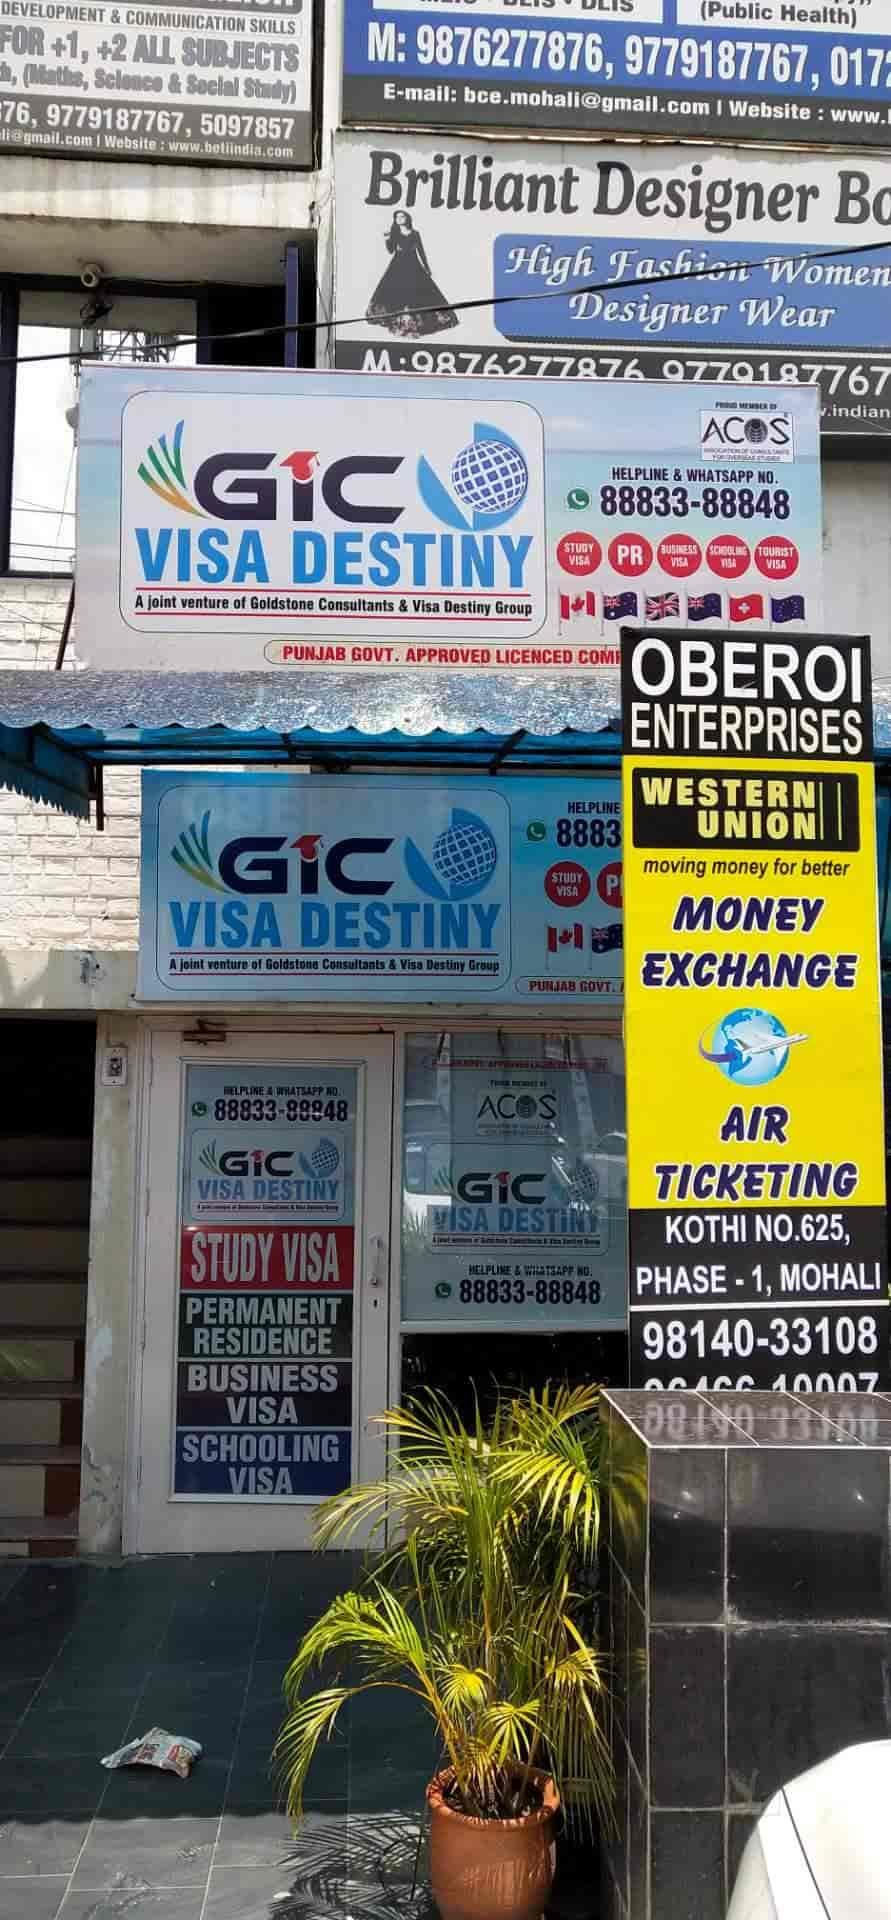 Gic Visa Destiny, Opposite Franco Hotel - Visa Assistance in